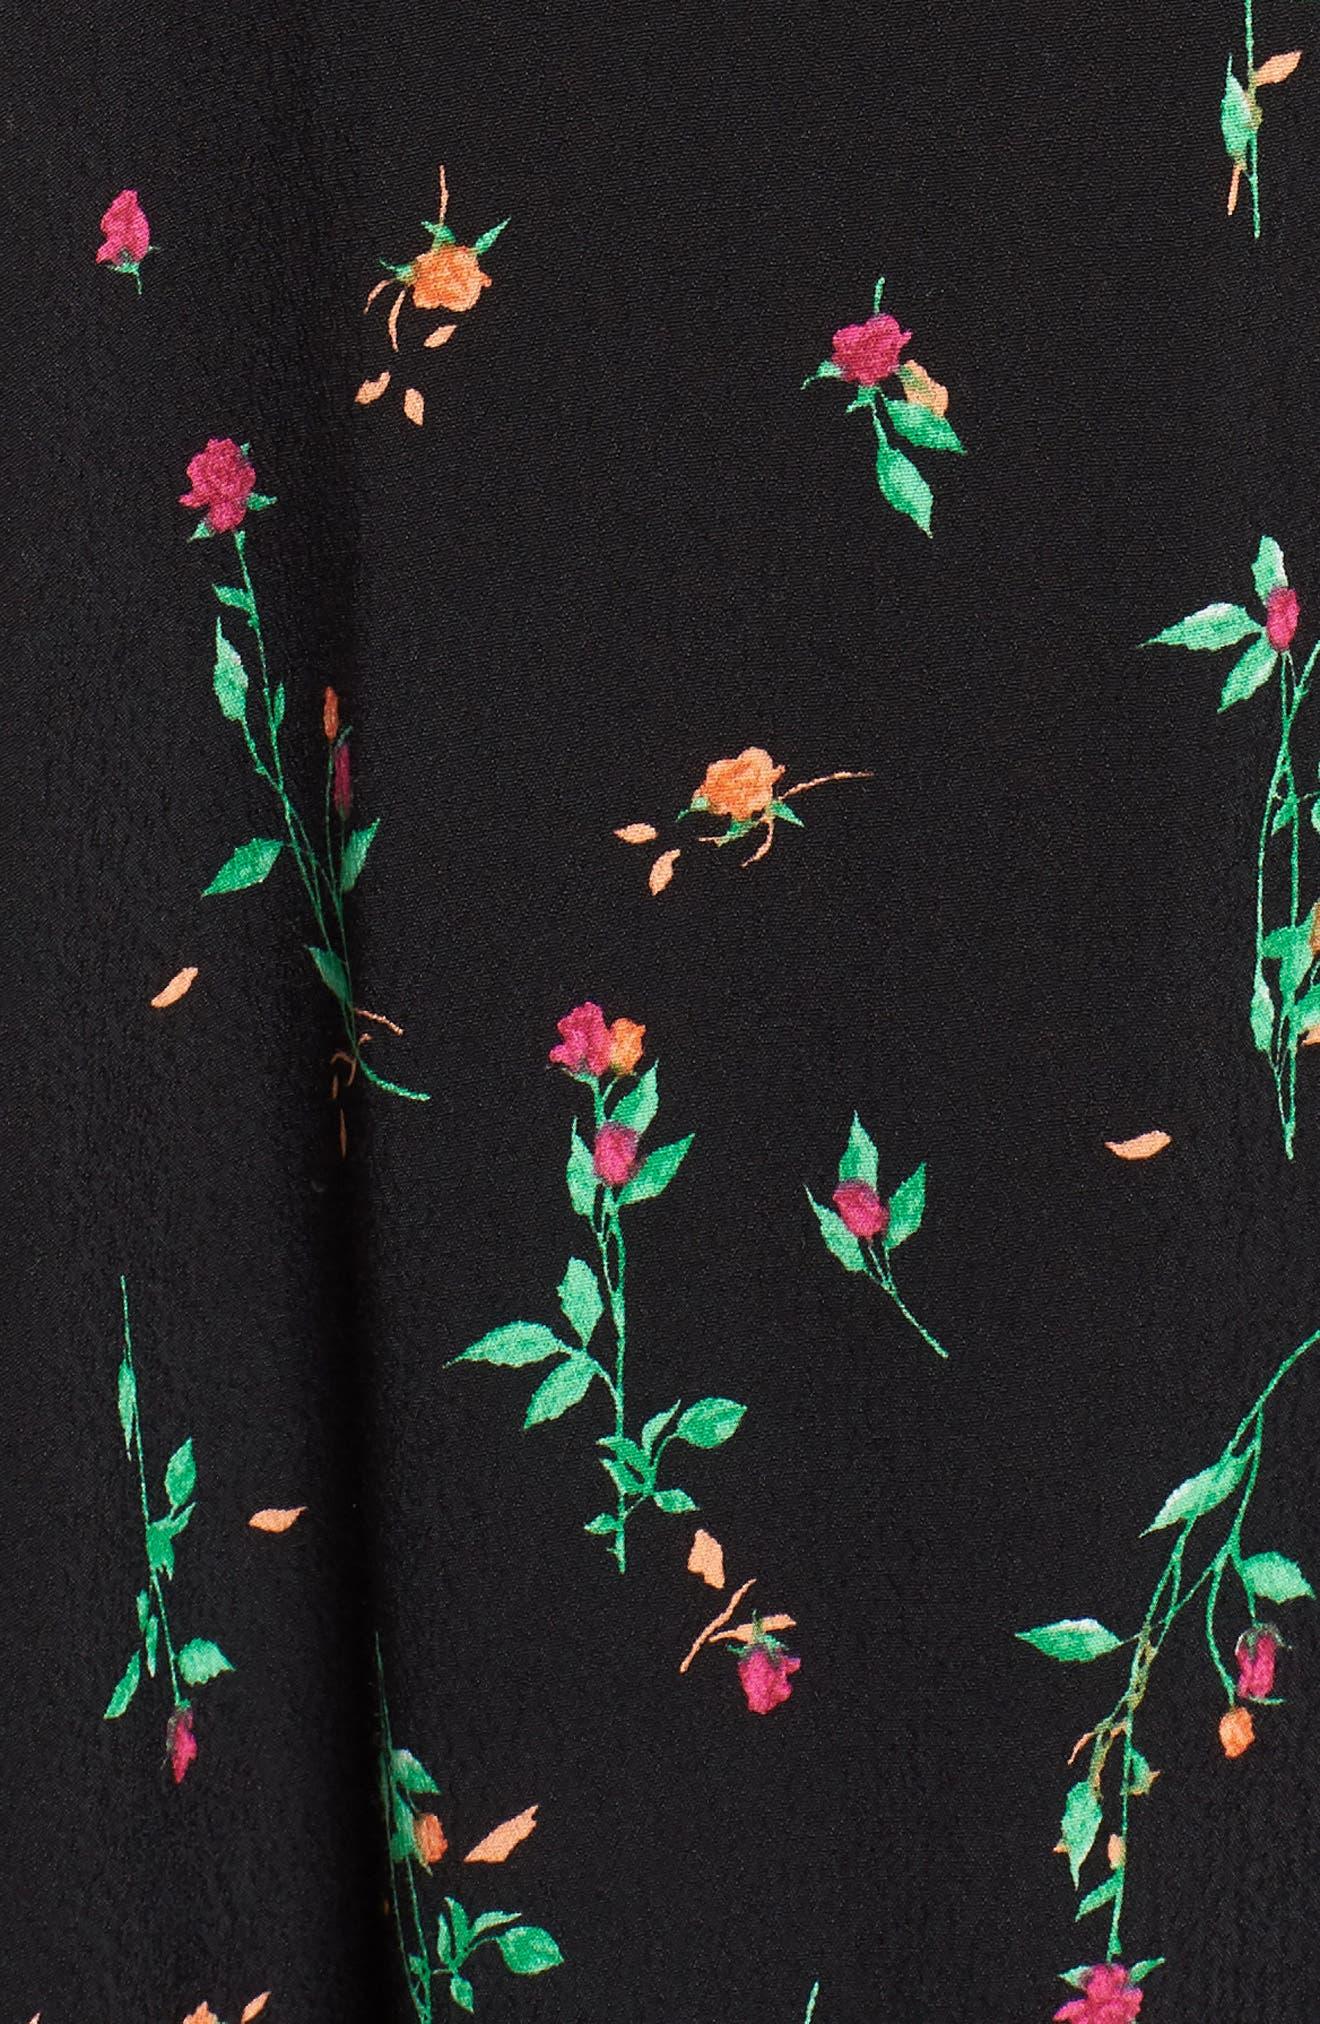 Ramon Tie Front Maxi Dress,                             Alternate thumbnail 5, color,                             Noir Rose Ditsy